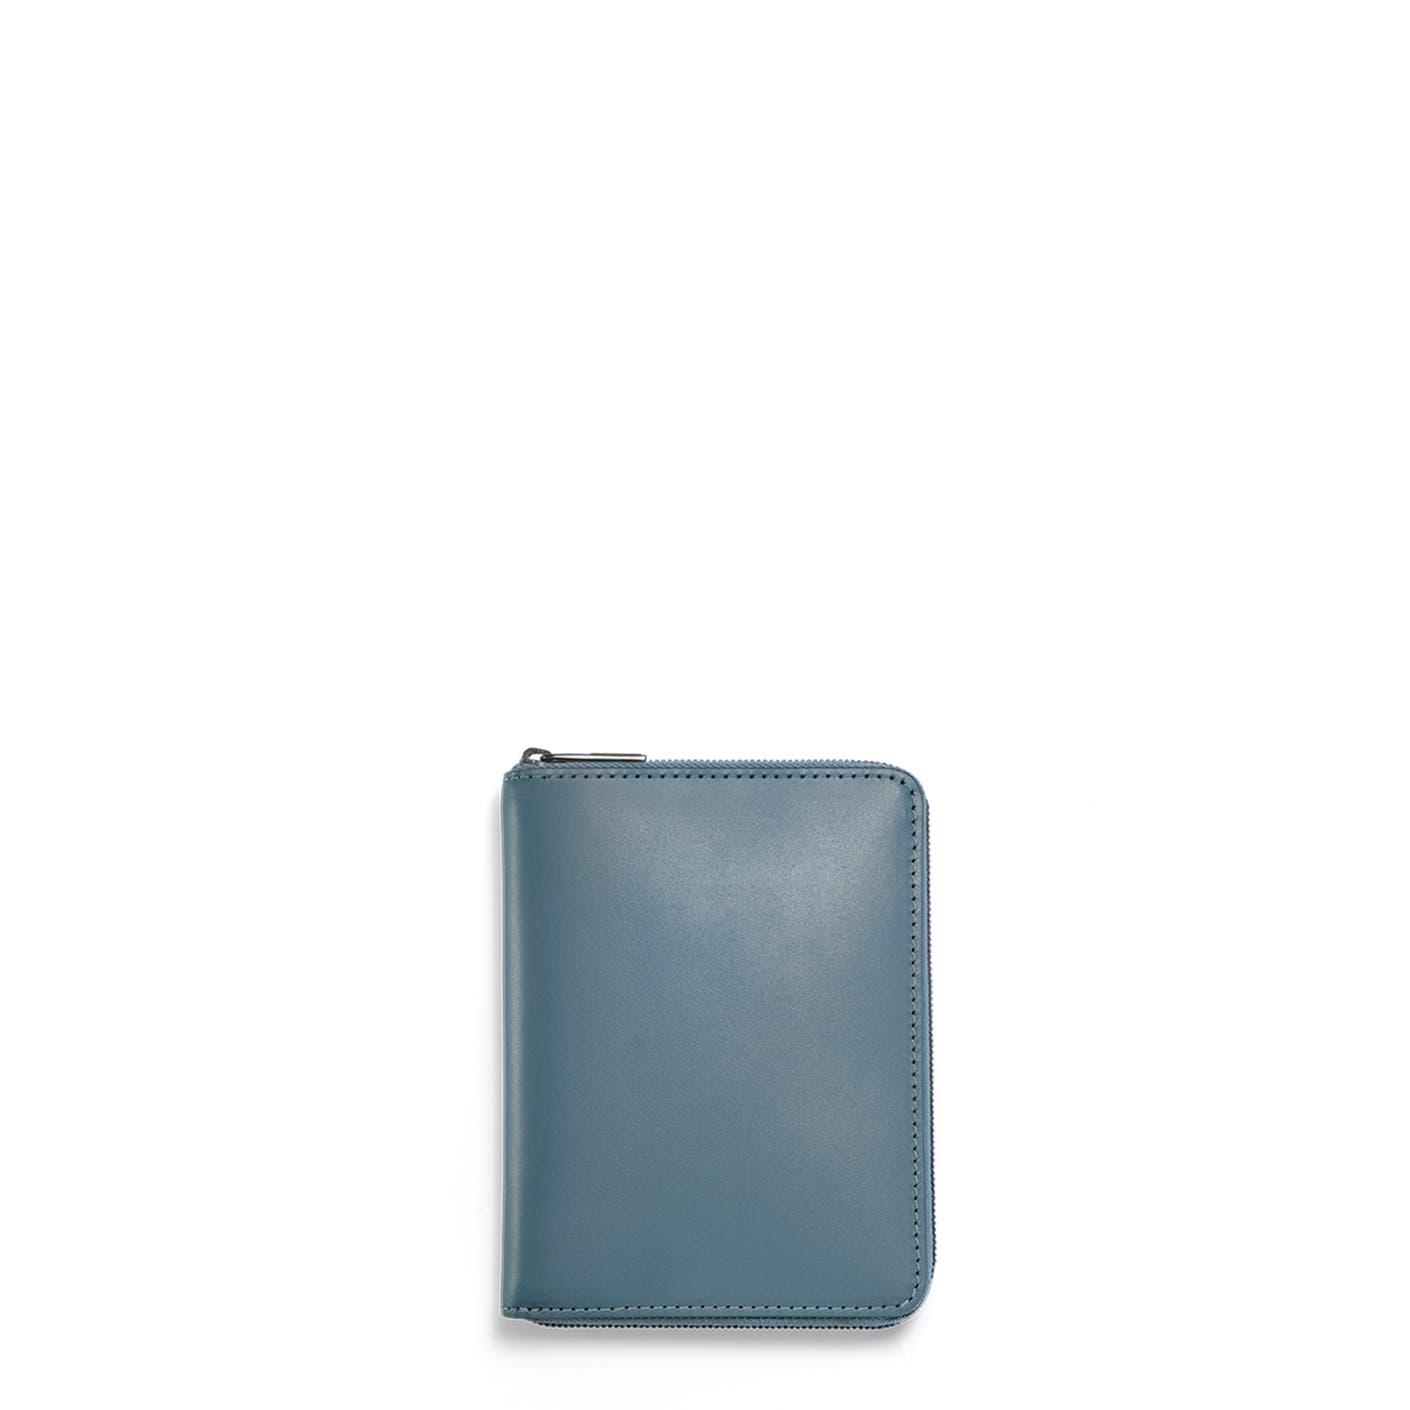 The Zip-Around Travel Wallet